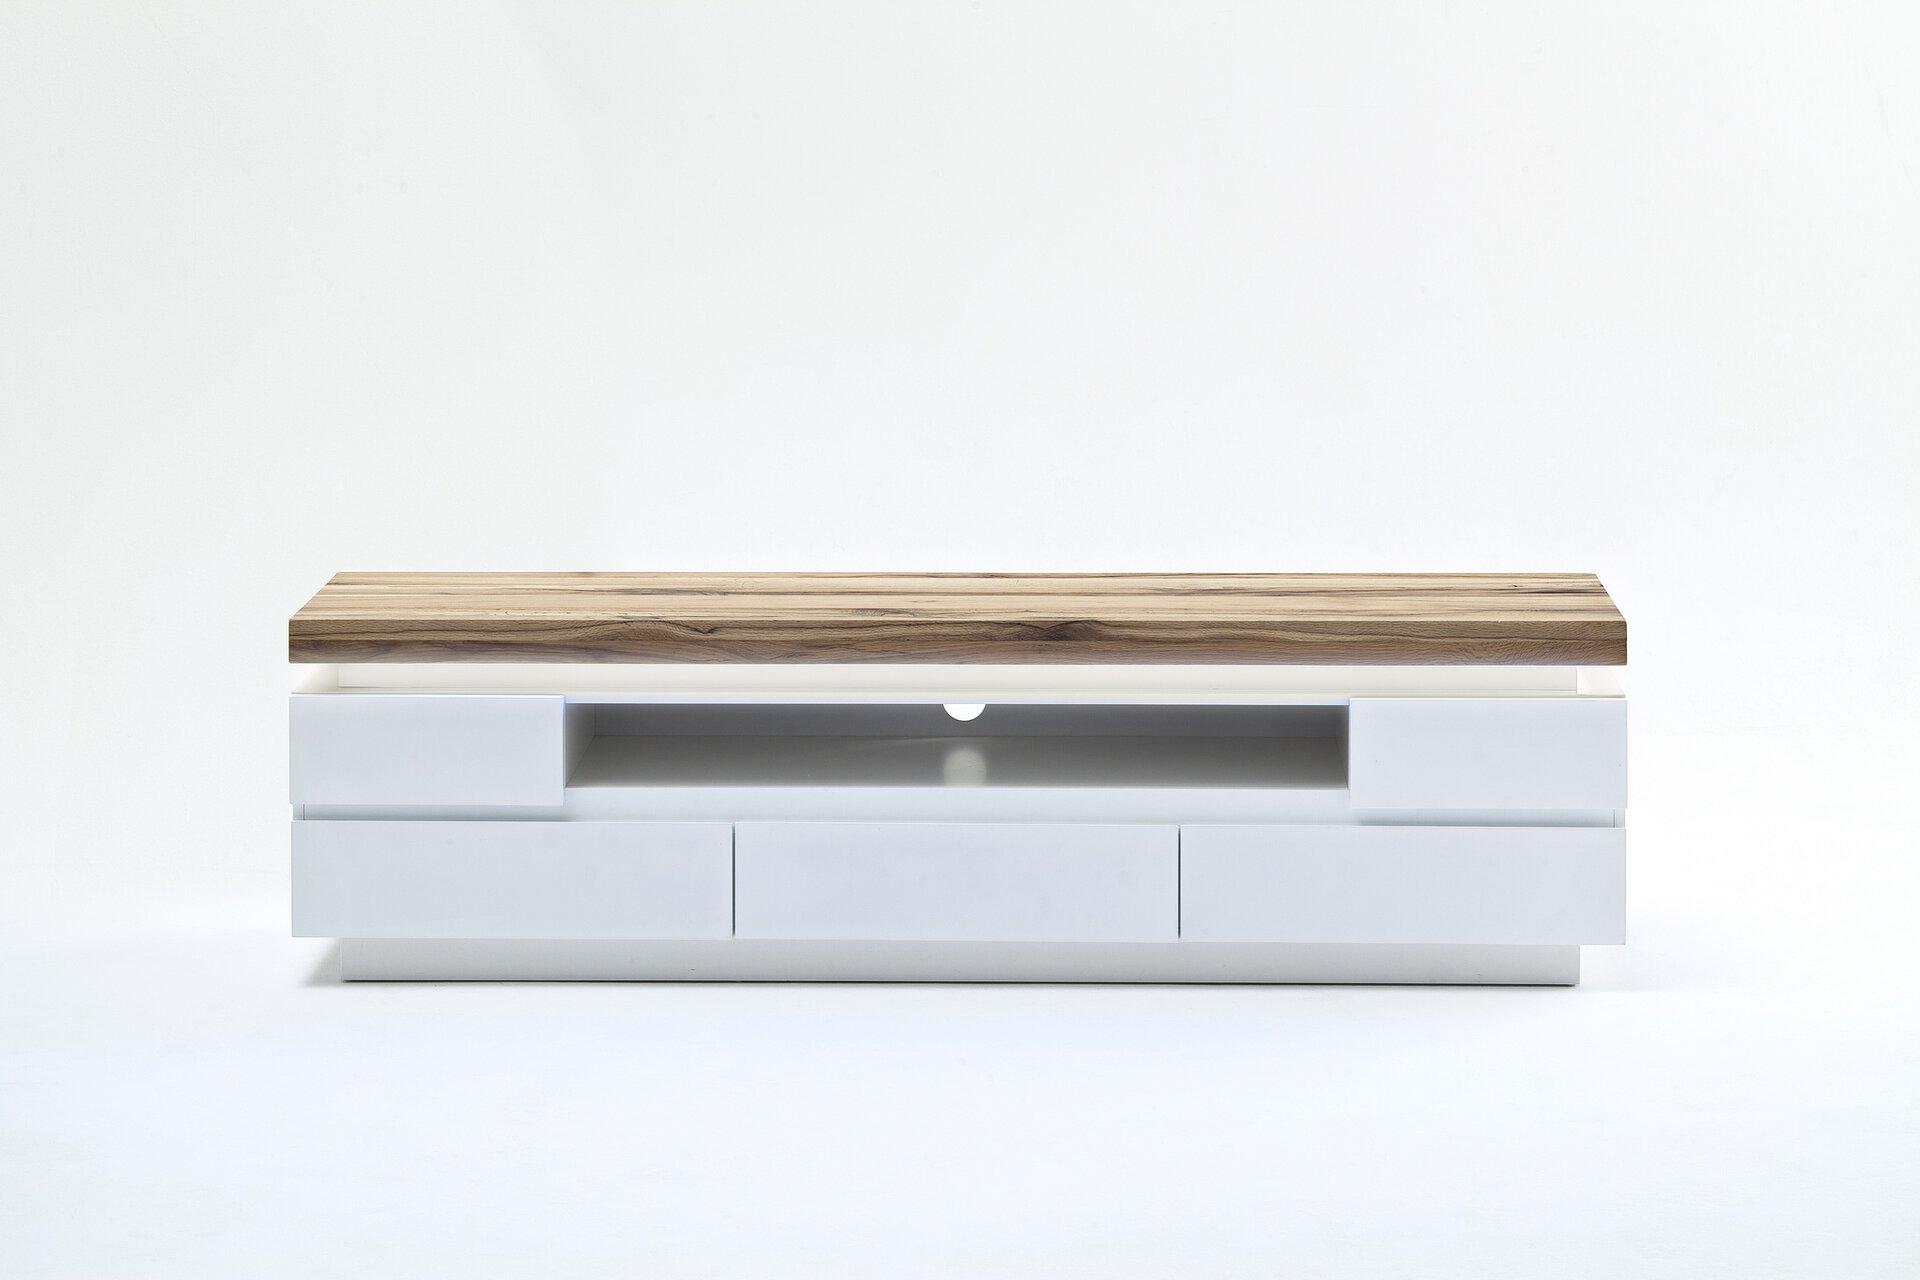 Lowboard ROMINA MCA furniture Holz 40 x 49 x 175 cm